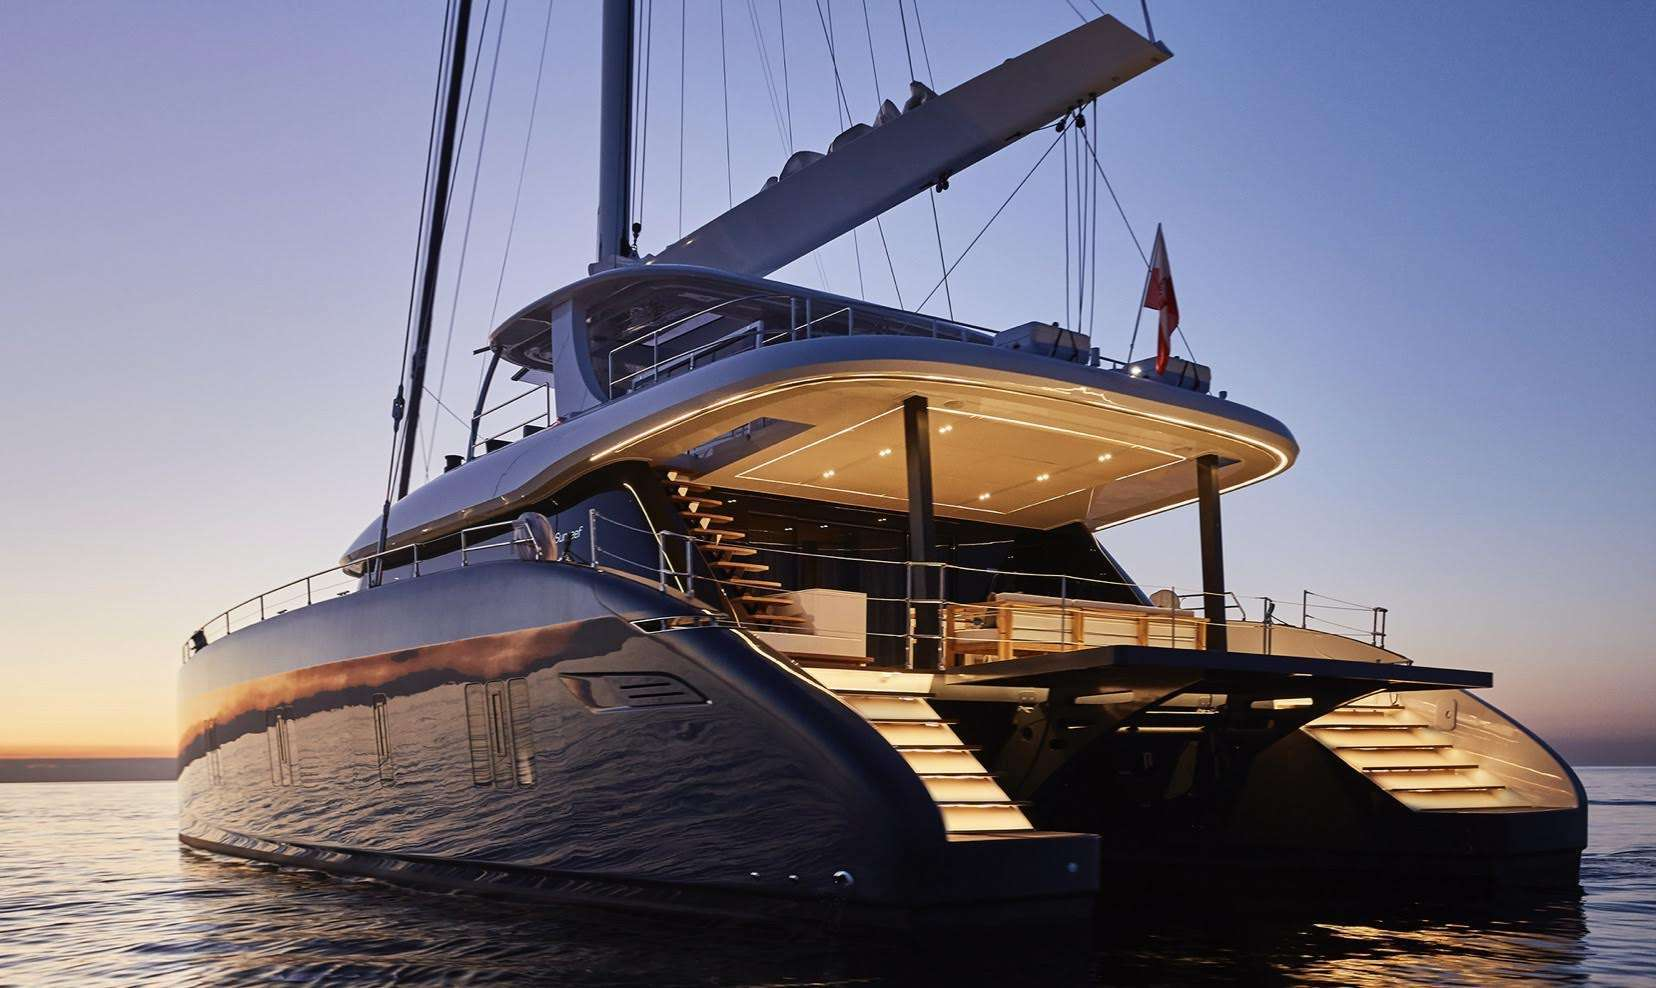 78ft Sunreef catamaran GENNY operates in Greece